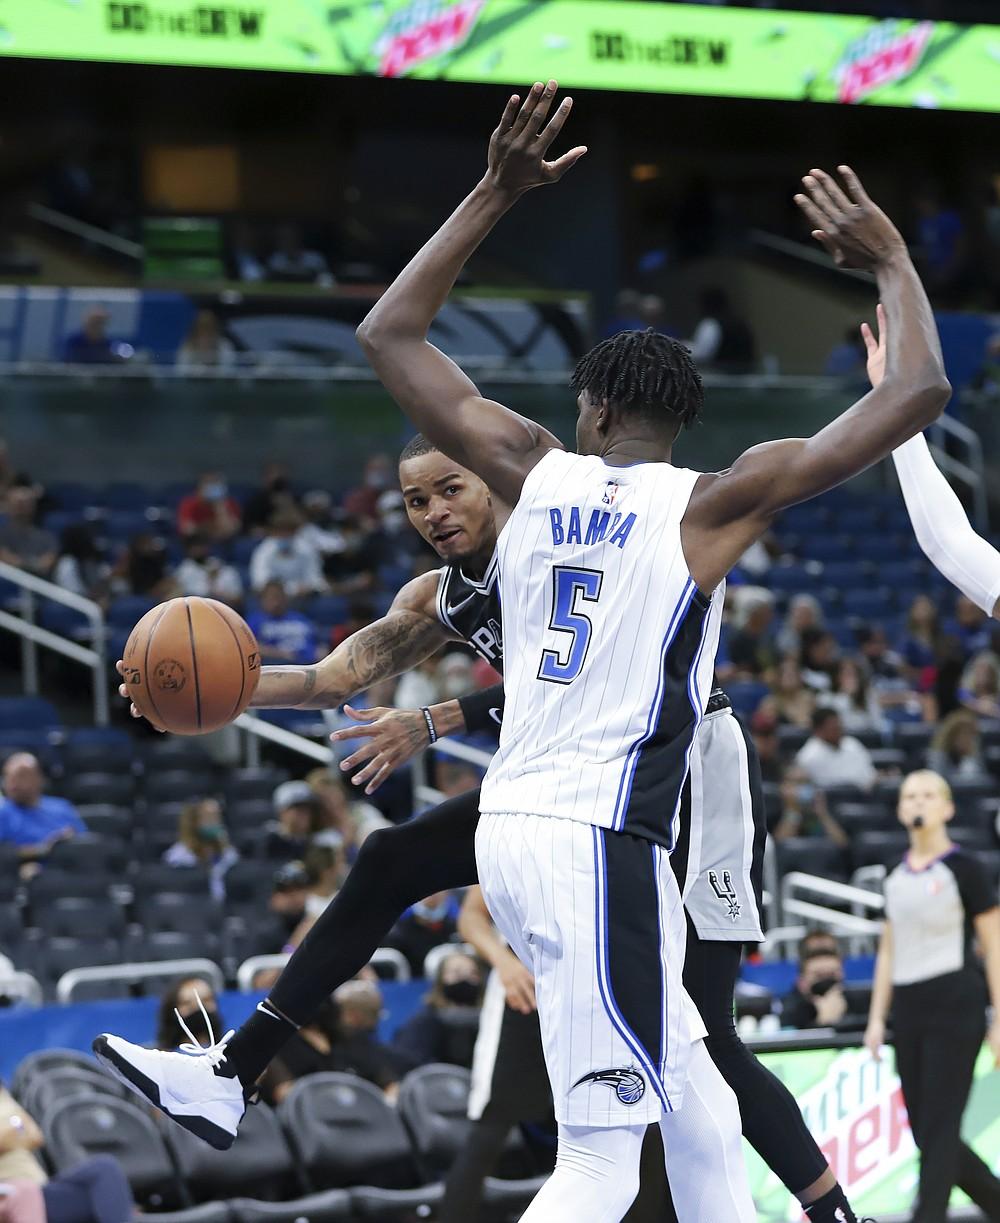 San Antonio Spurs guard Dejounte Murray, left, passes the ball behind Orlando Magic center Mo Bamba's back during the second half of an a preseason NBA basketball game, Sunday, Oct. 10, 2021, in Orlando, Fla. (AP Photo/Jacob M. Langston)